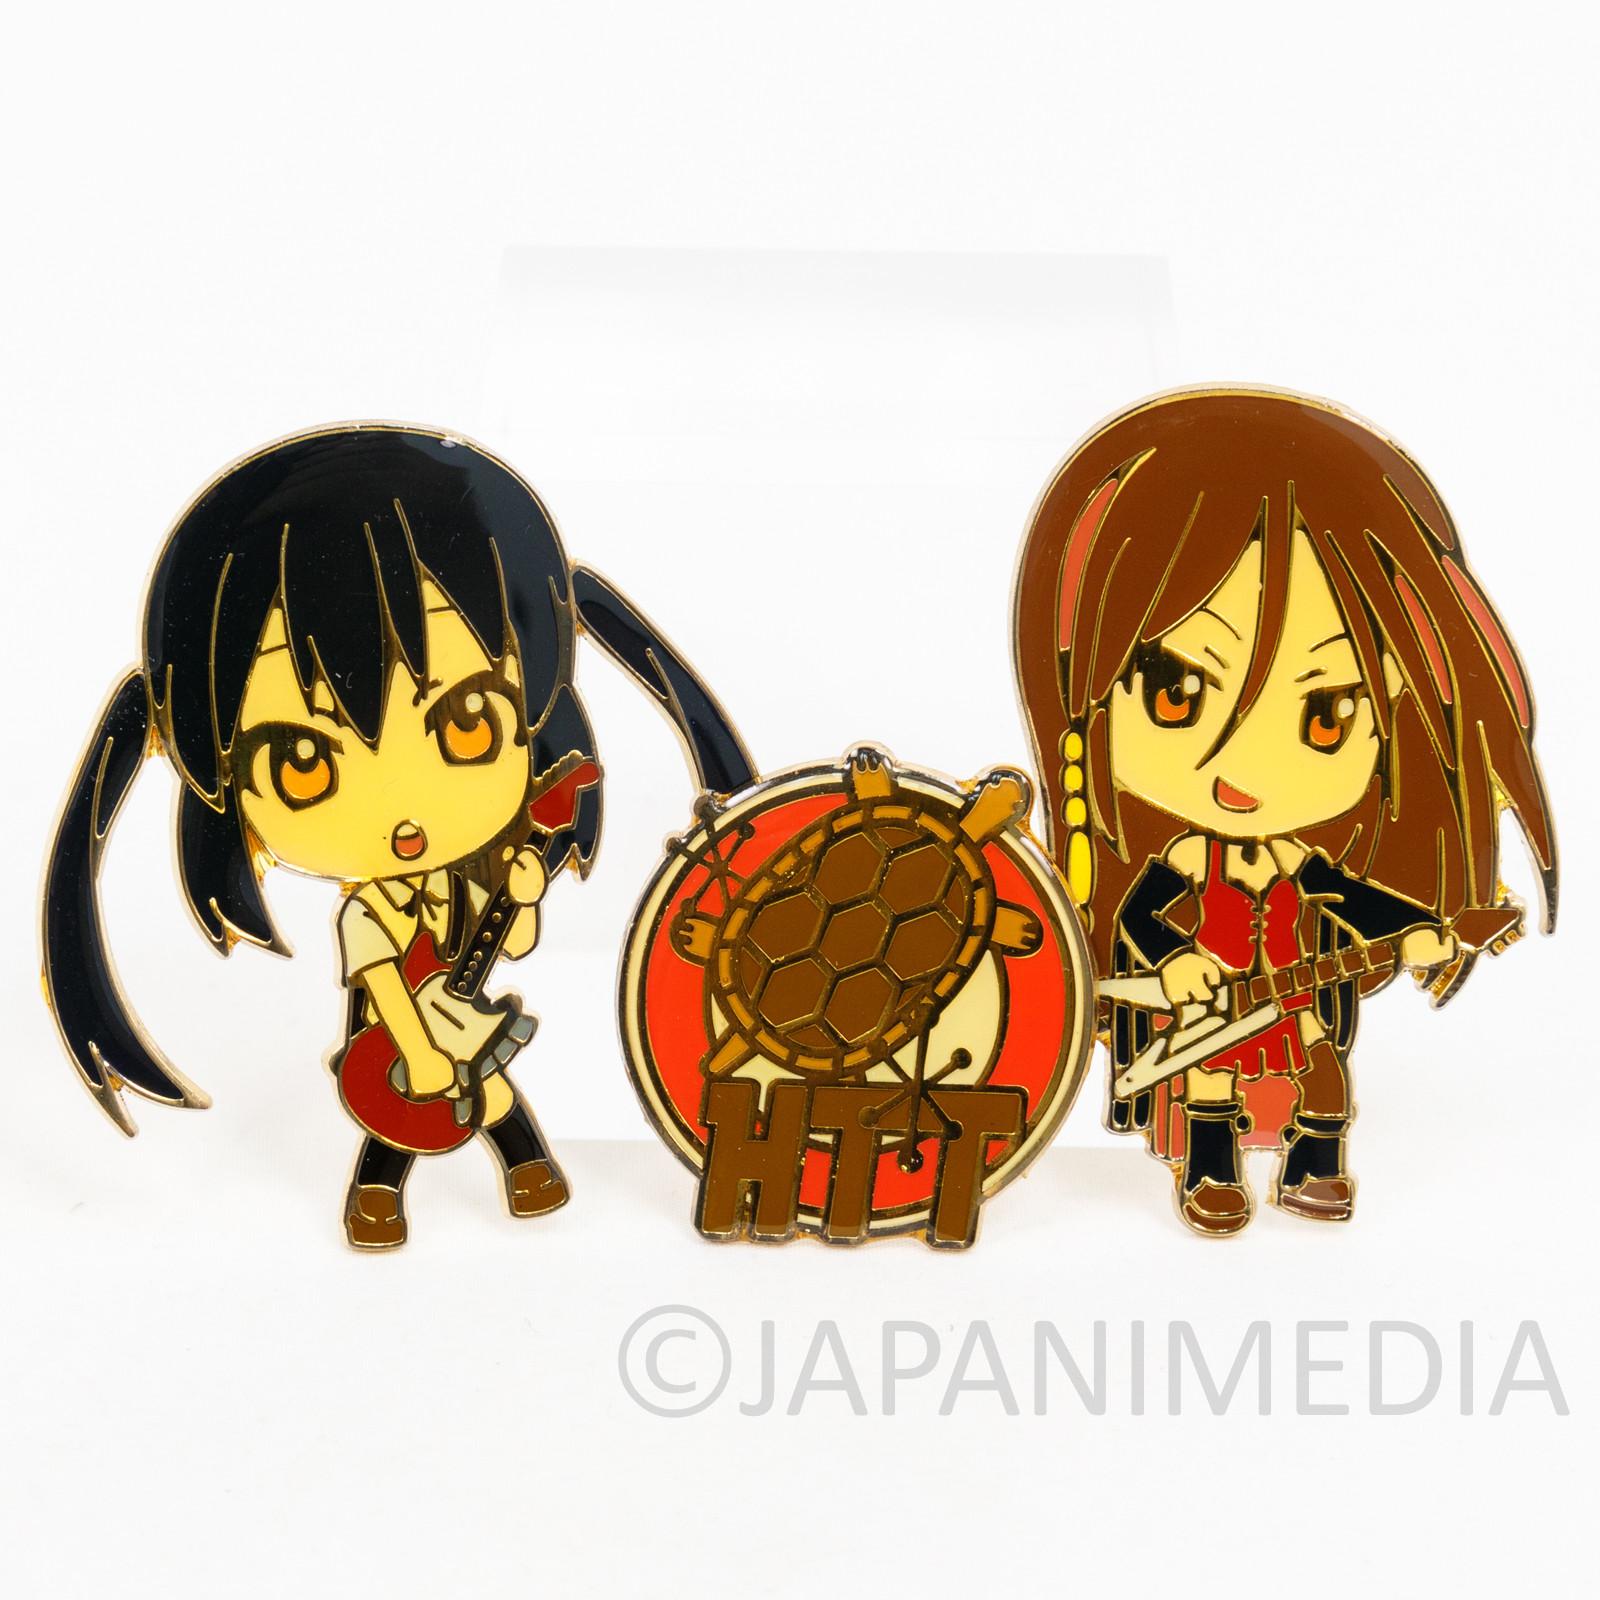 K-ON! Azusa Nakano & Sawako Yamanaka Metal Pins Set JAPAN KYOTO ANIMATION